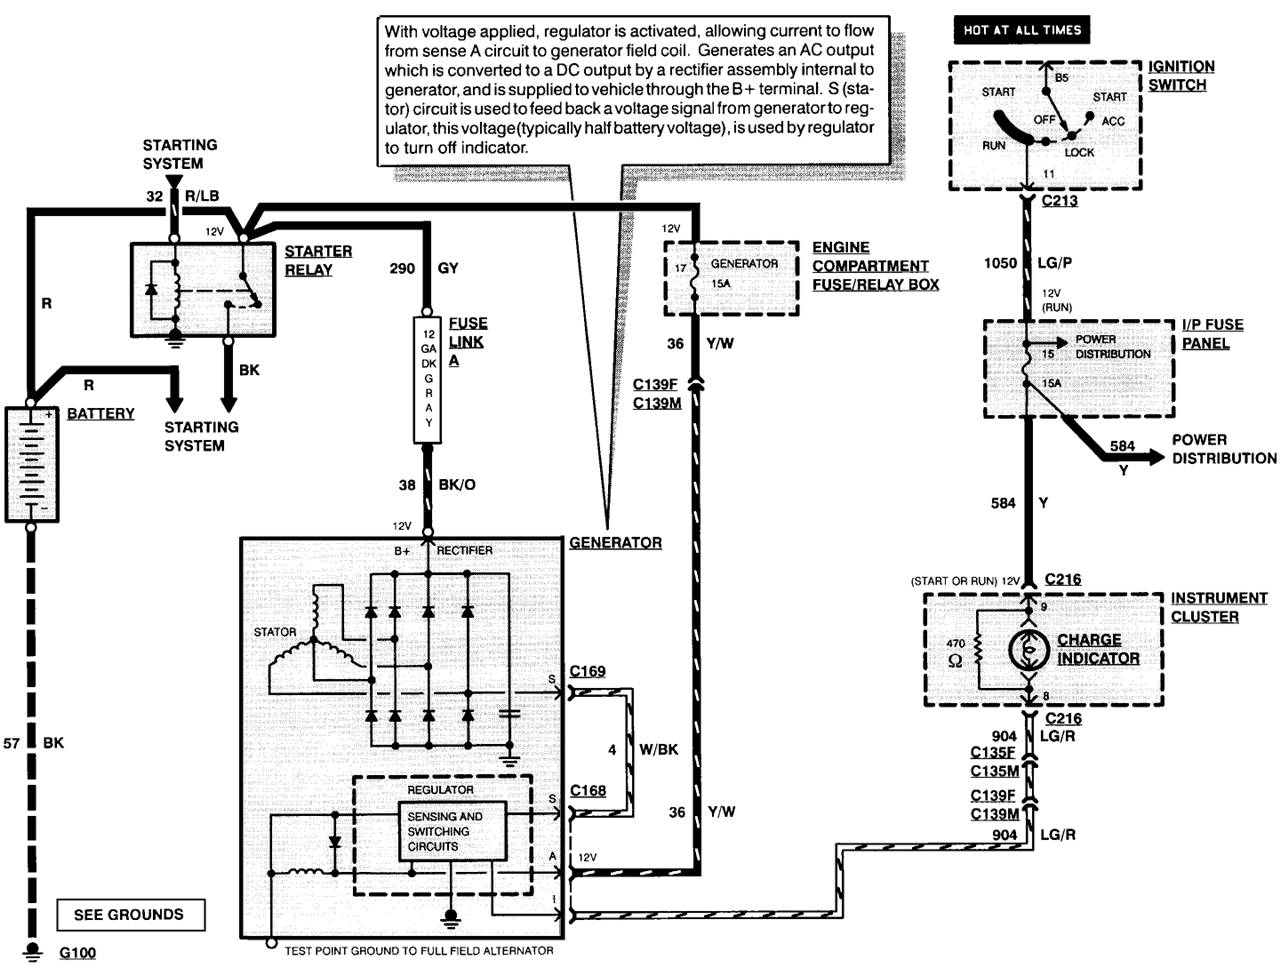 Miraculous 1983 Ford Bronco Wiring Diagram Today Diagram Data Schema Wiring Cloud Staixaidewilluminateatxorg